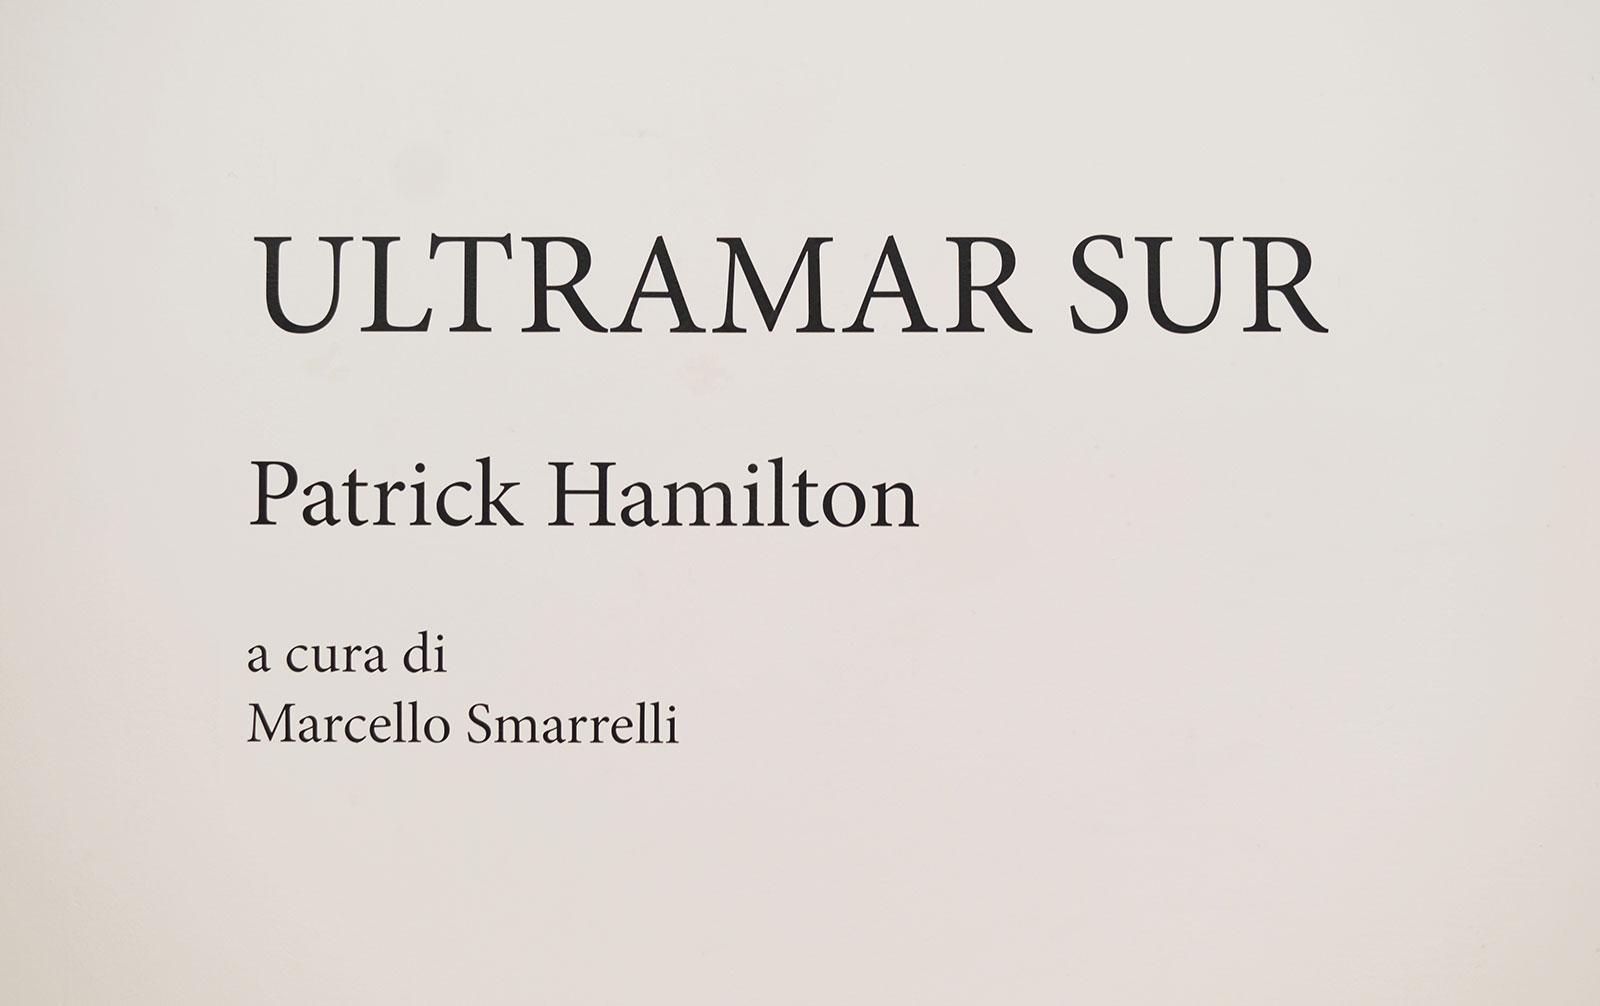 01_PatrickHamilton_UltramarSur_FPC